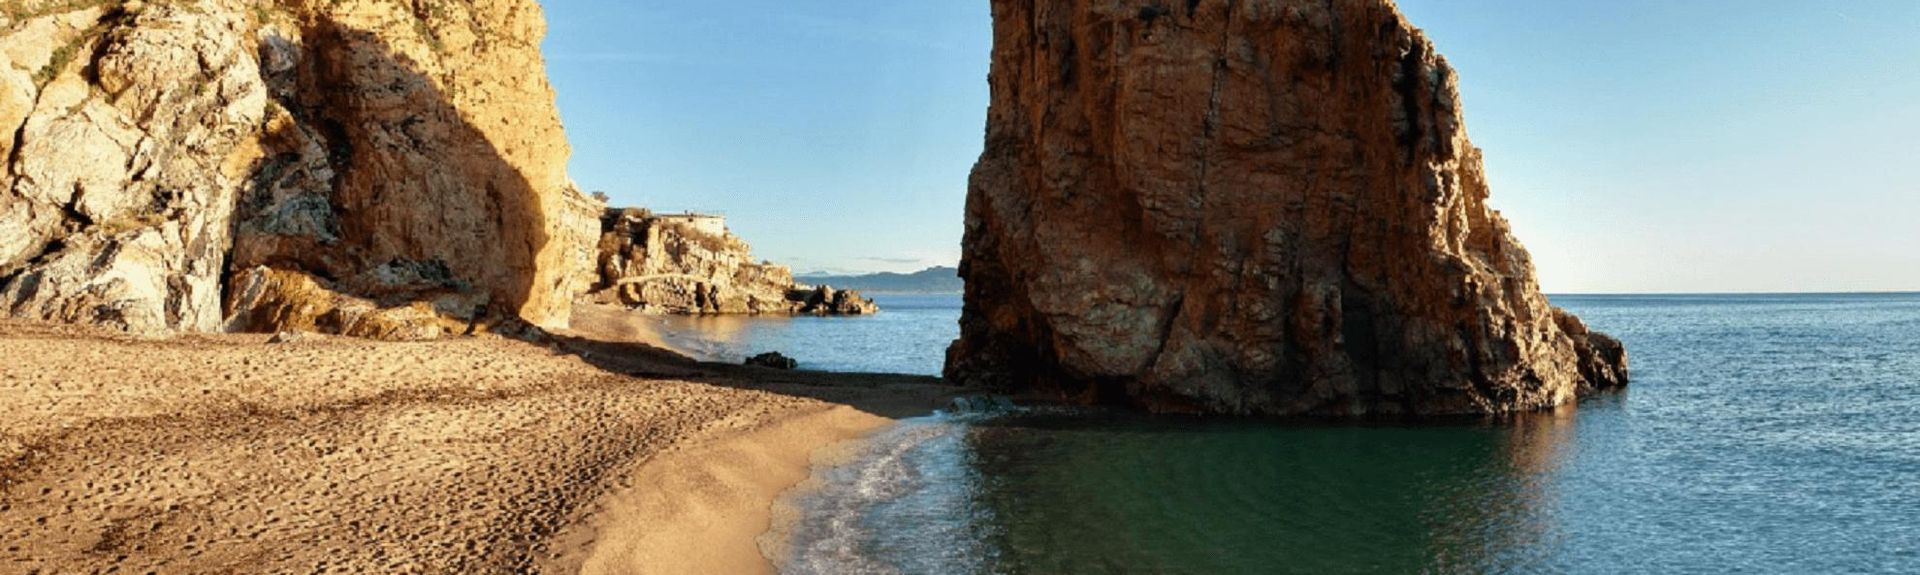 Jafre, Province of Girona, Spain